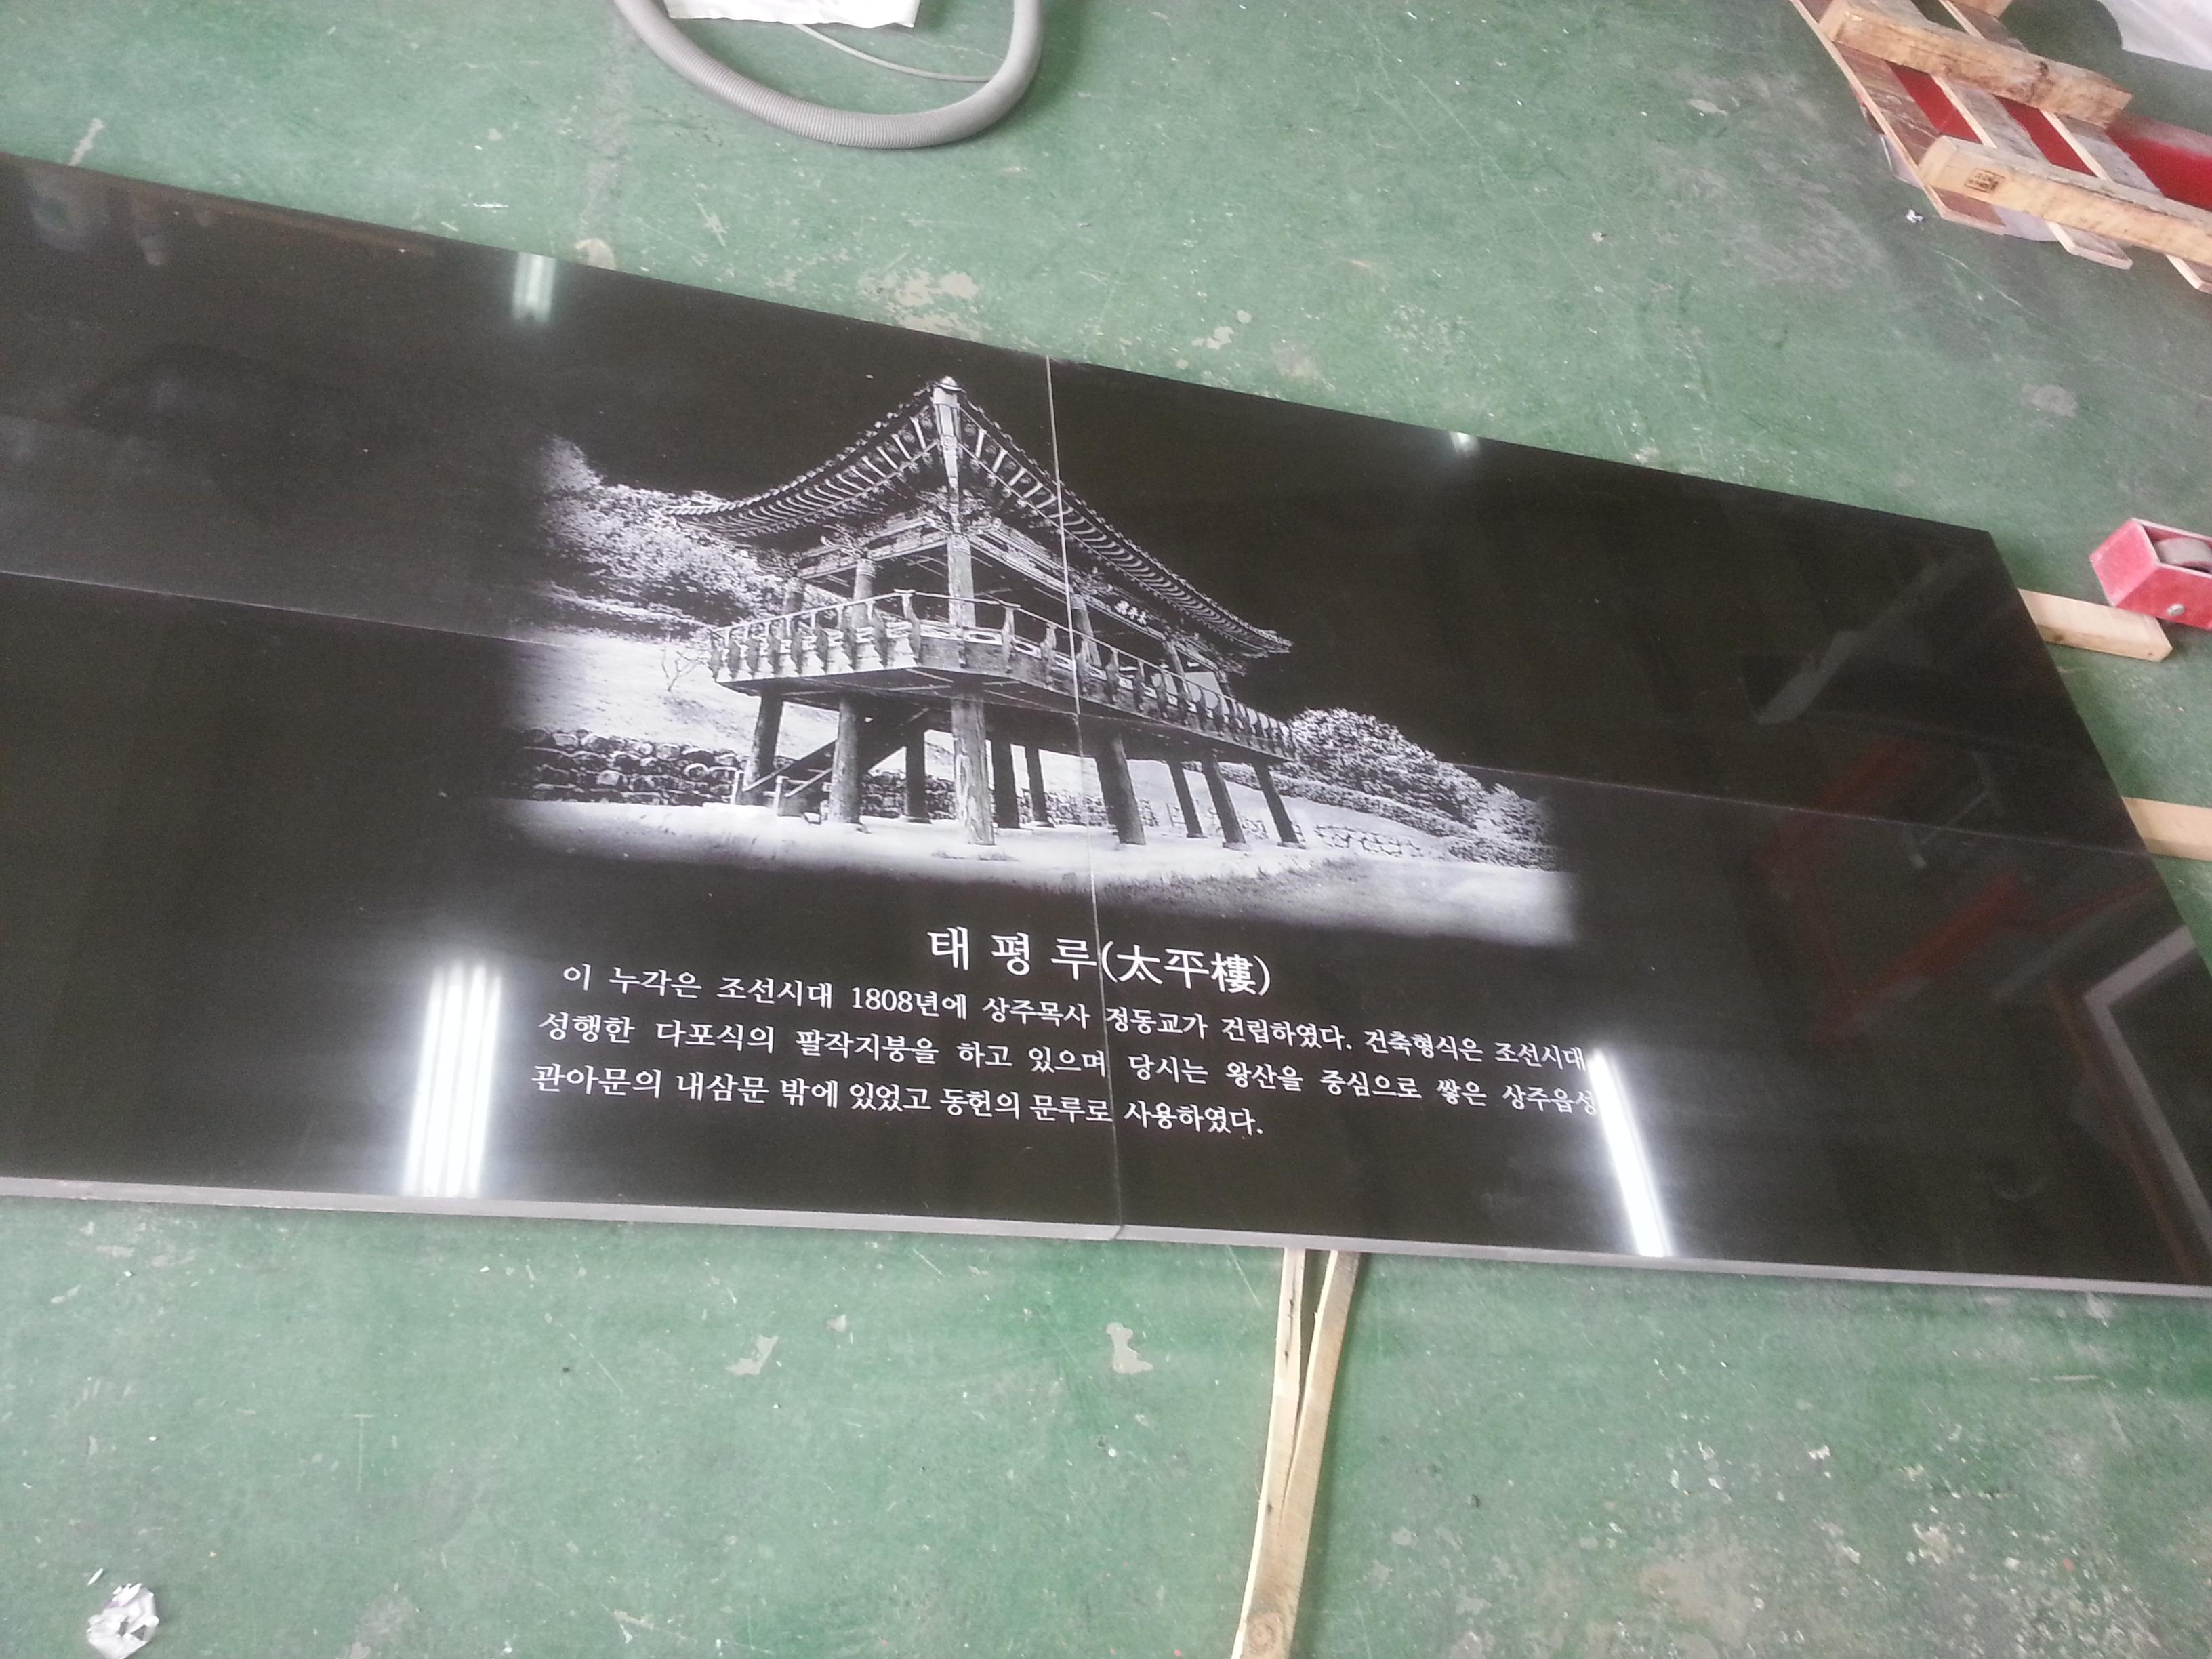 sangju_stone.jpg